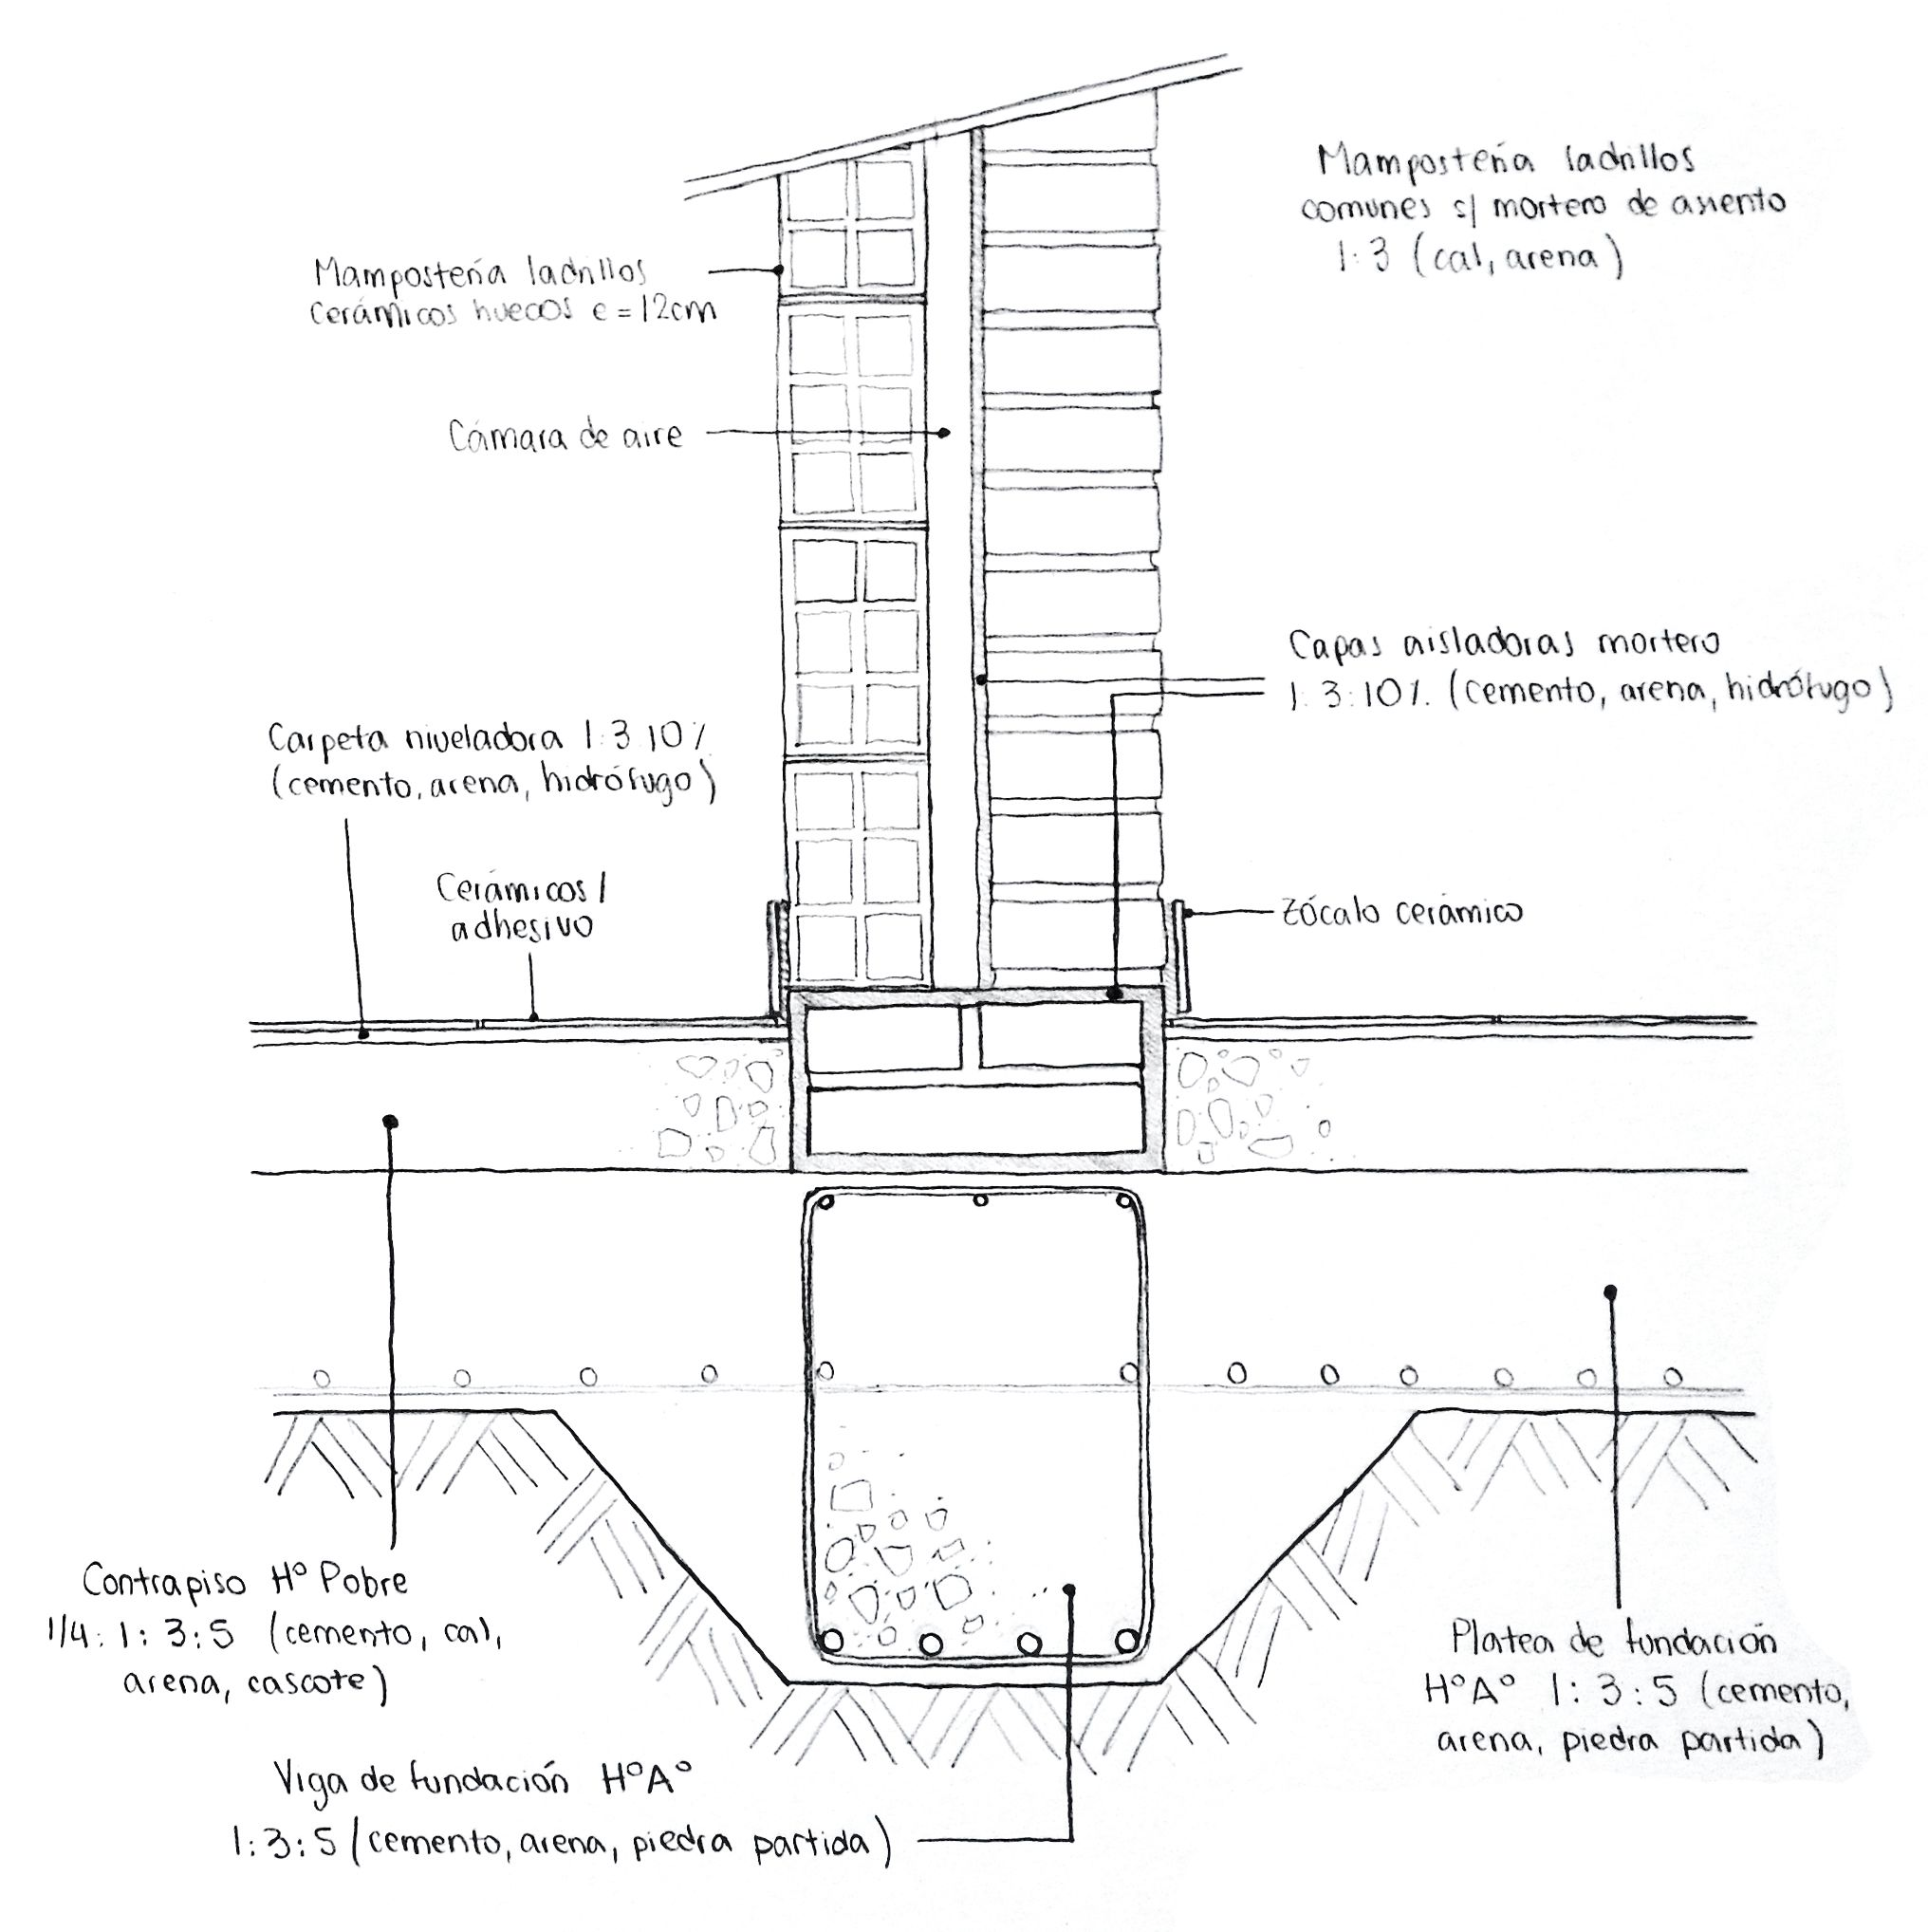 Platea de fundaci n muro doble ladrillo hueco interior ladrillo com n exterior - Medidas de ladrillos comunes ...